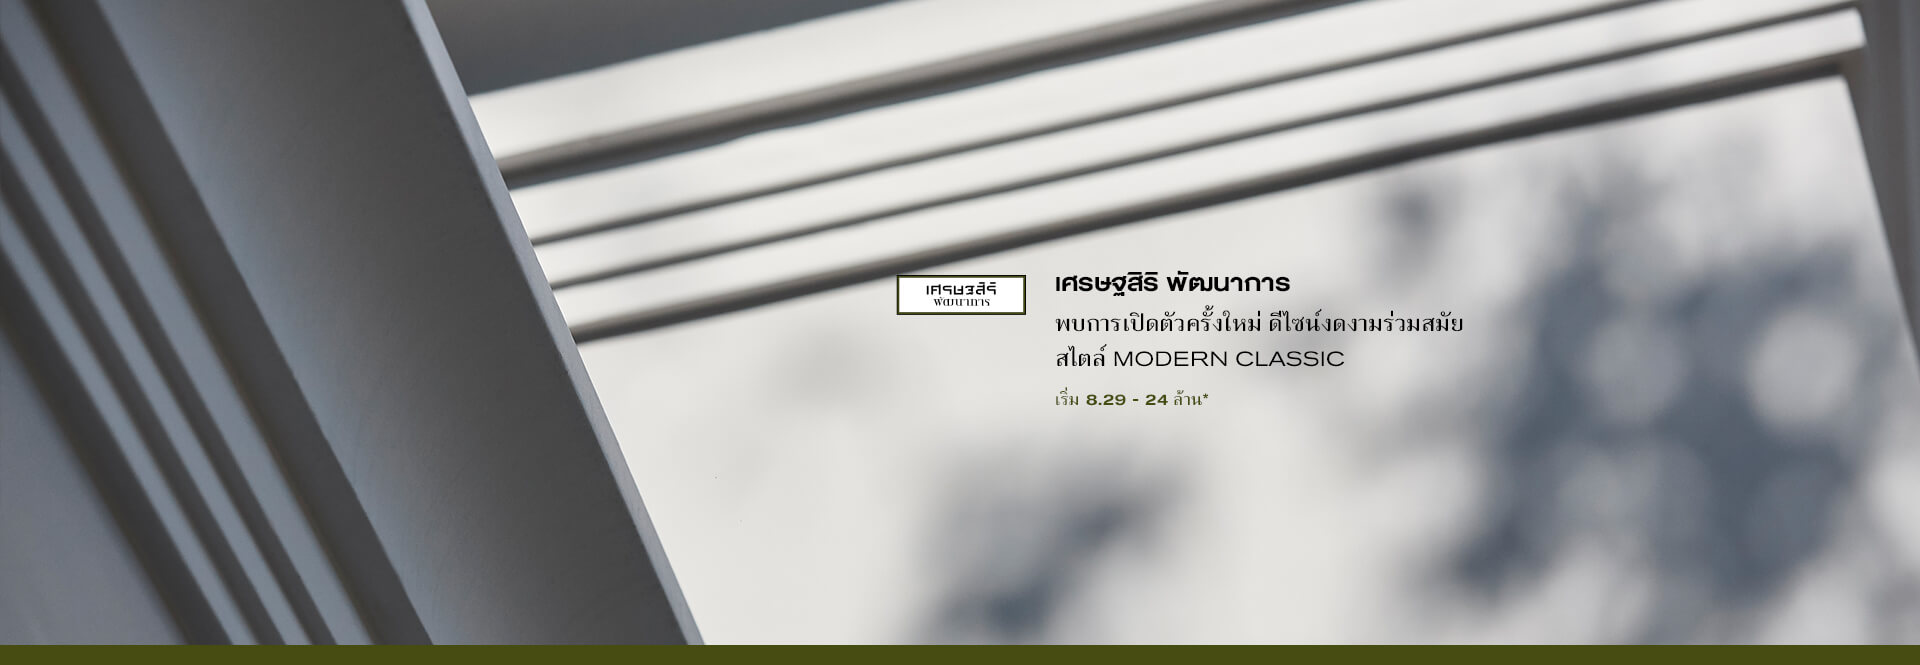 Setthasiri Pattanakarn Media Plan Aug-Sep'19